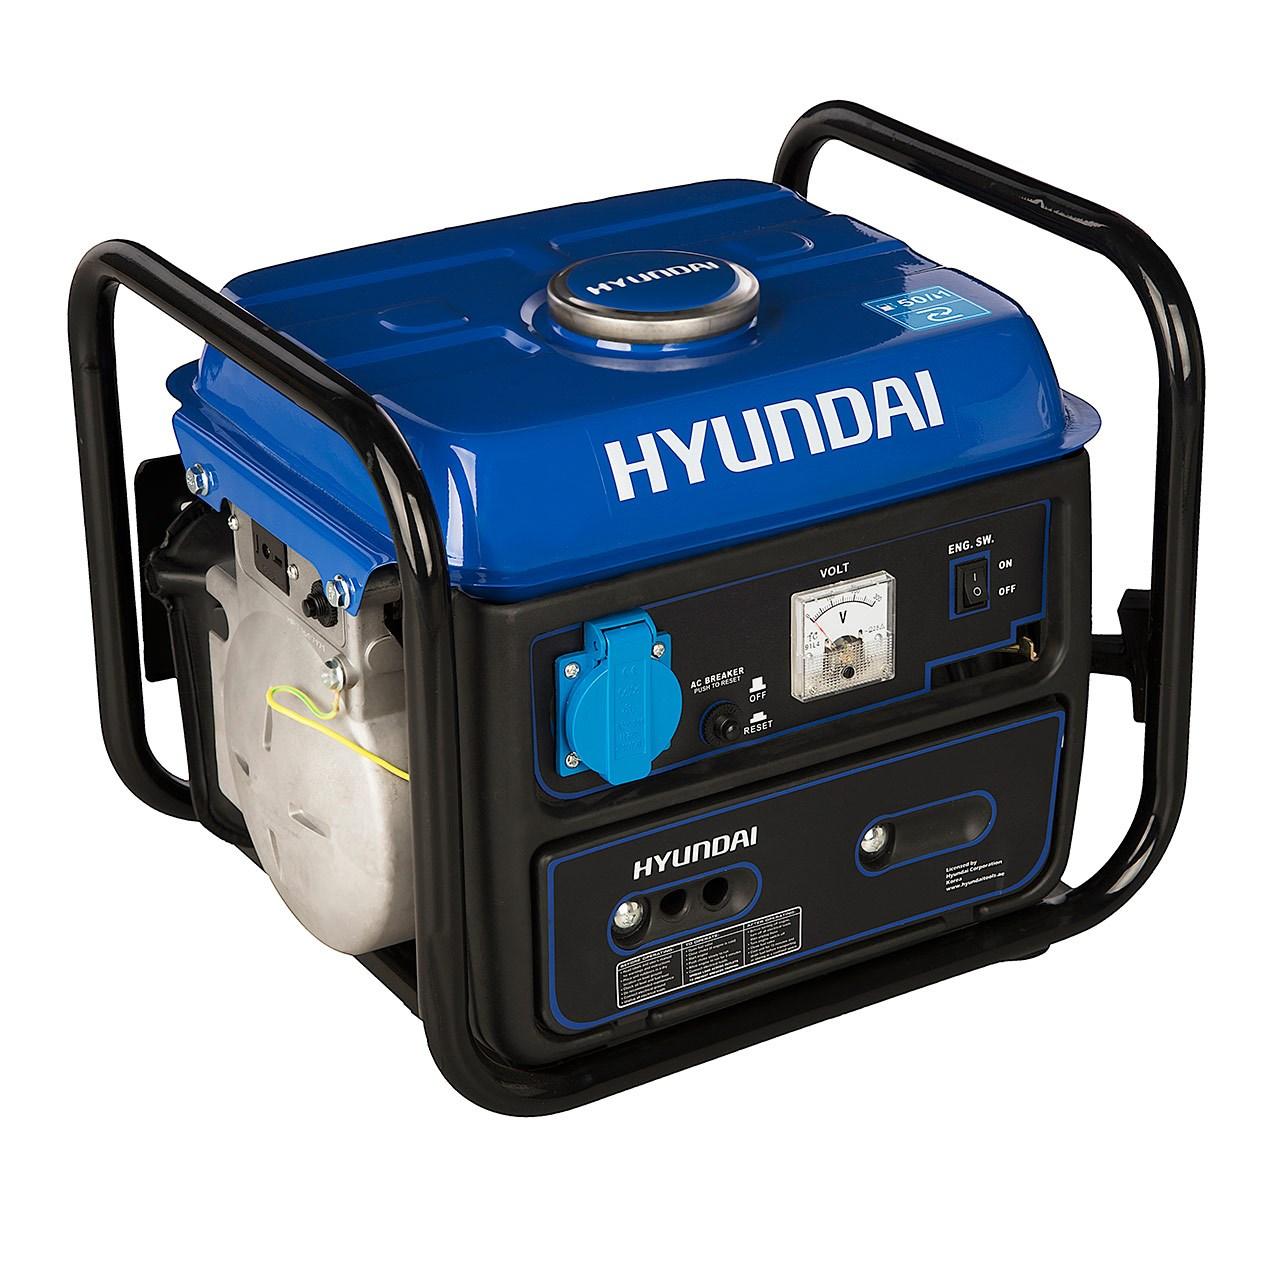 موتور برق 0.8 کیلو وات هیوندای مدل HG2010-PG | Hyundai HG2010-PG Electric Engine